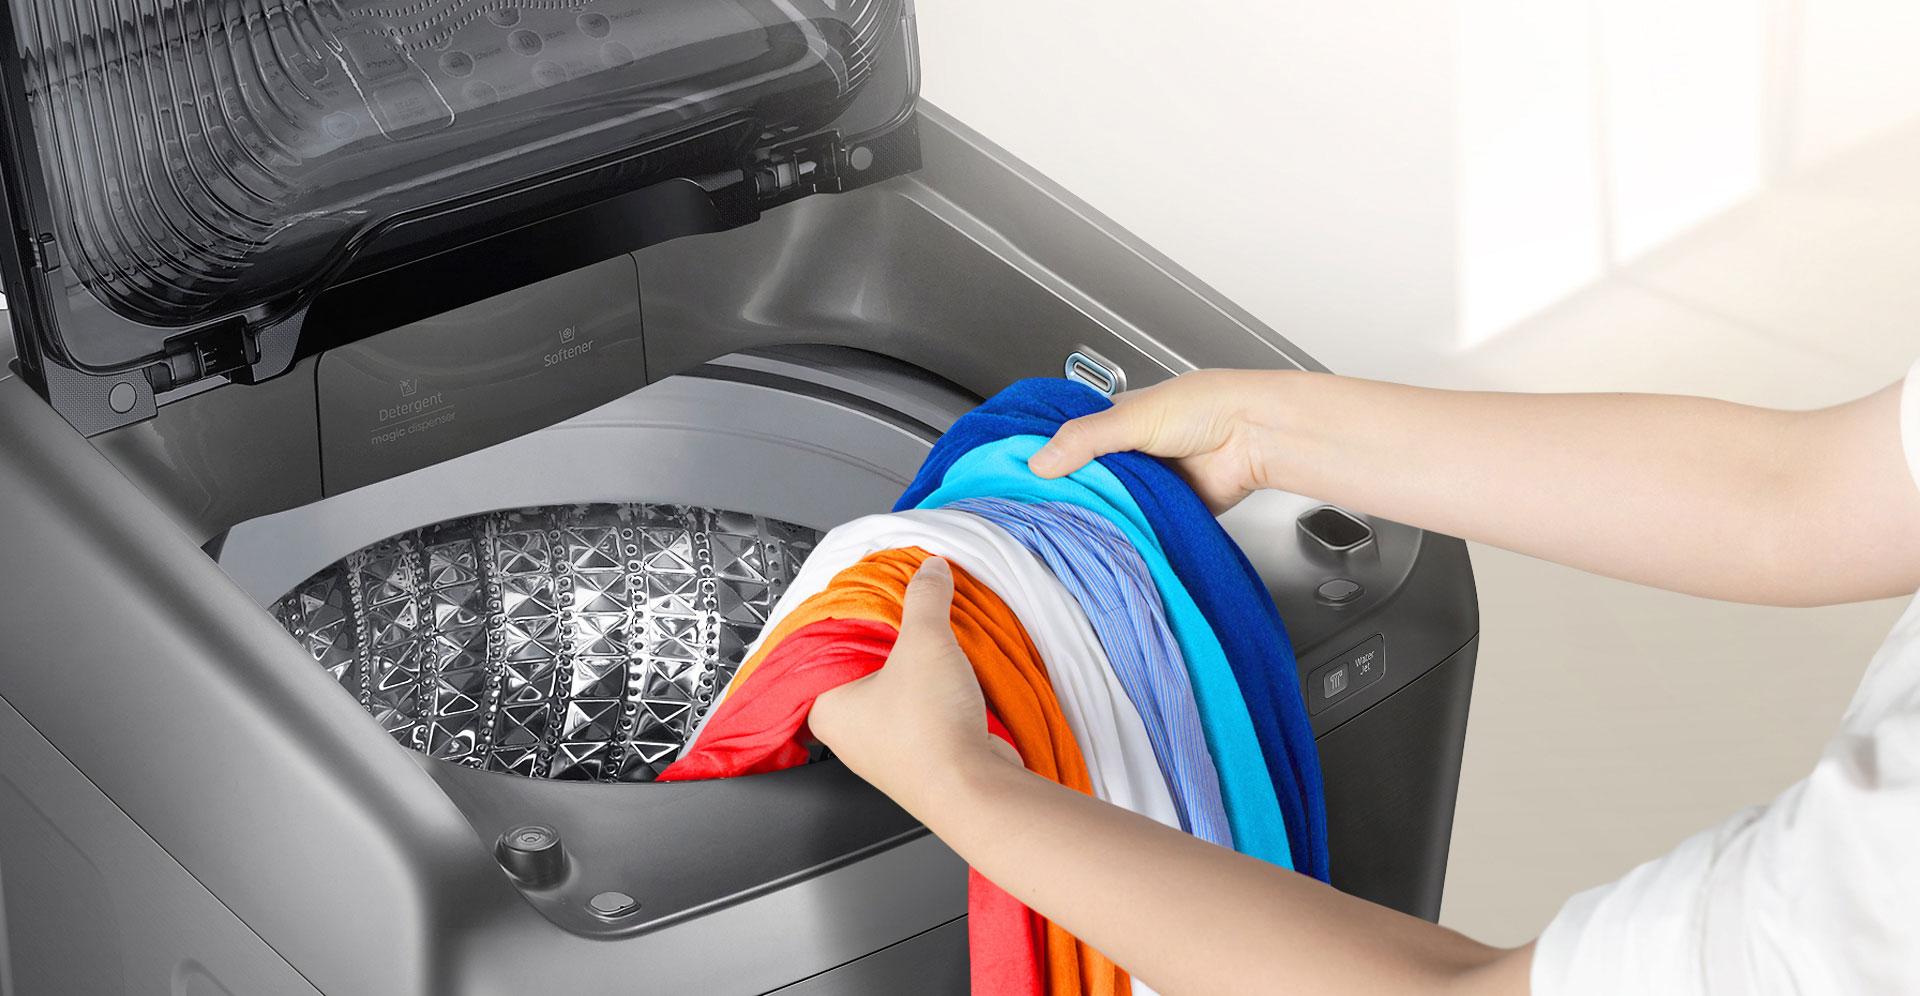 home-appliances-washing-machines-top-loa